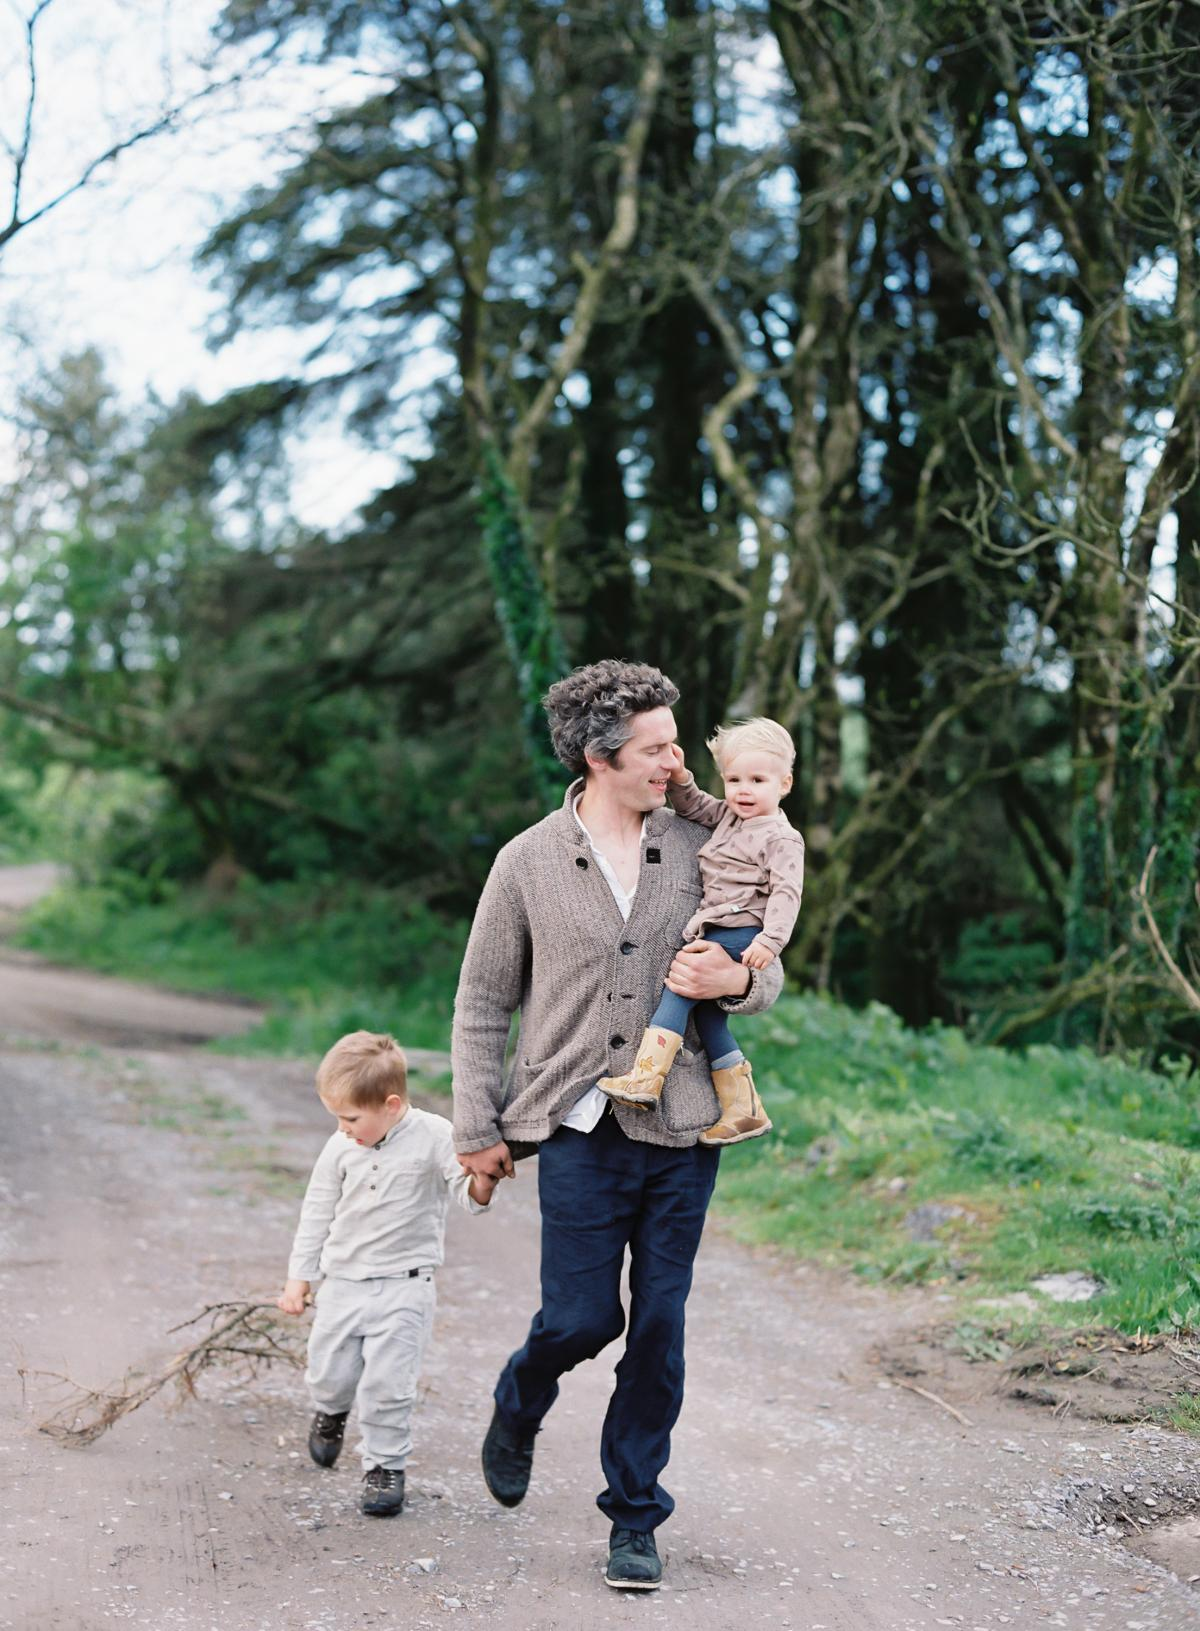 Pearl collins godiva cork ireland family photos 0019